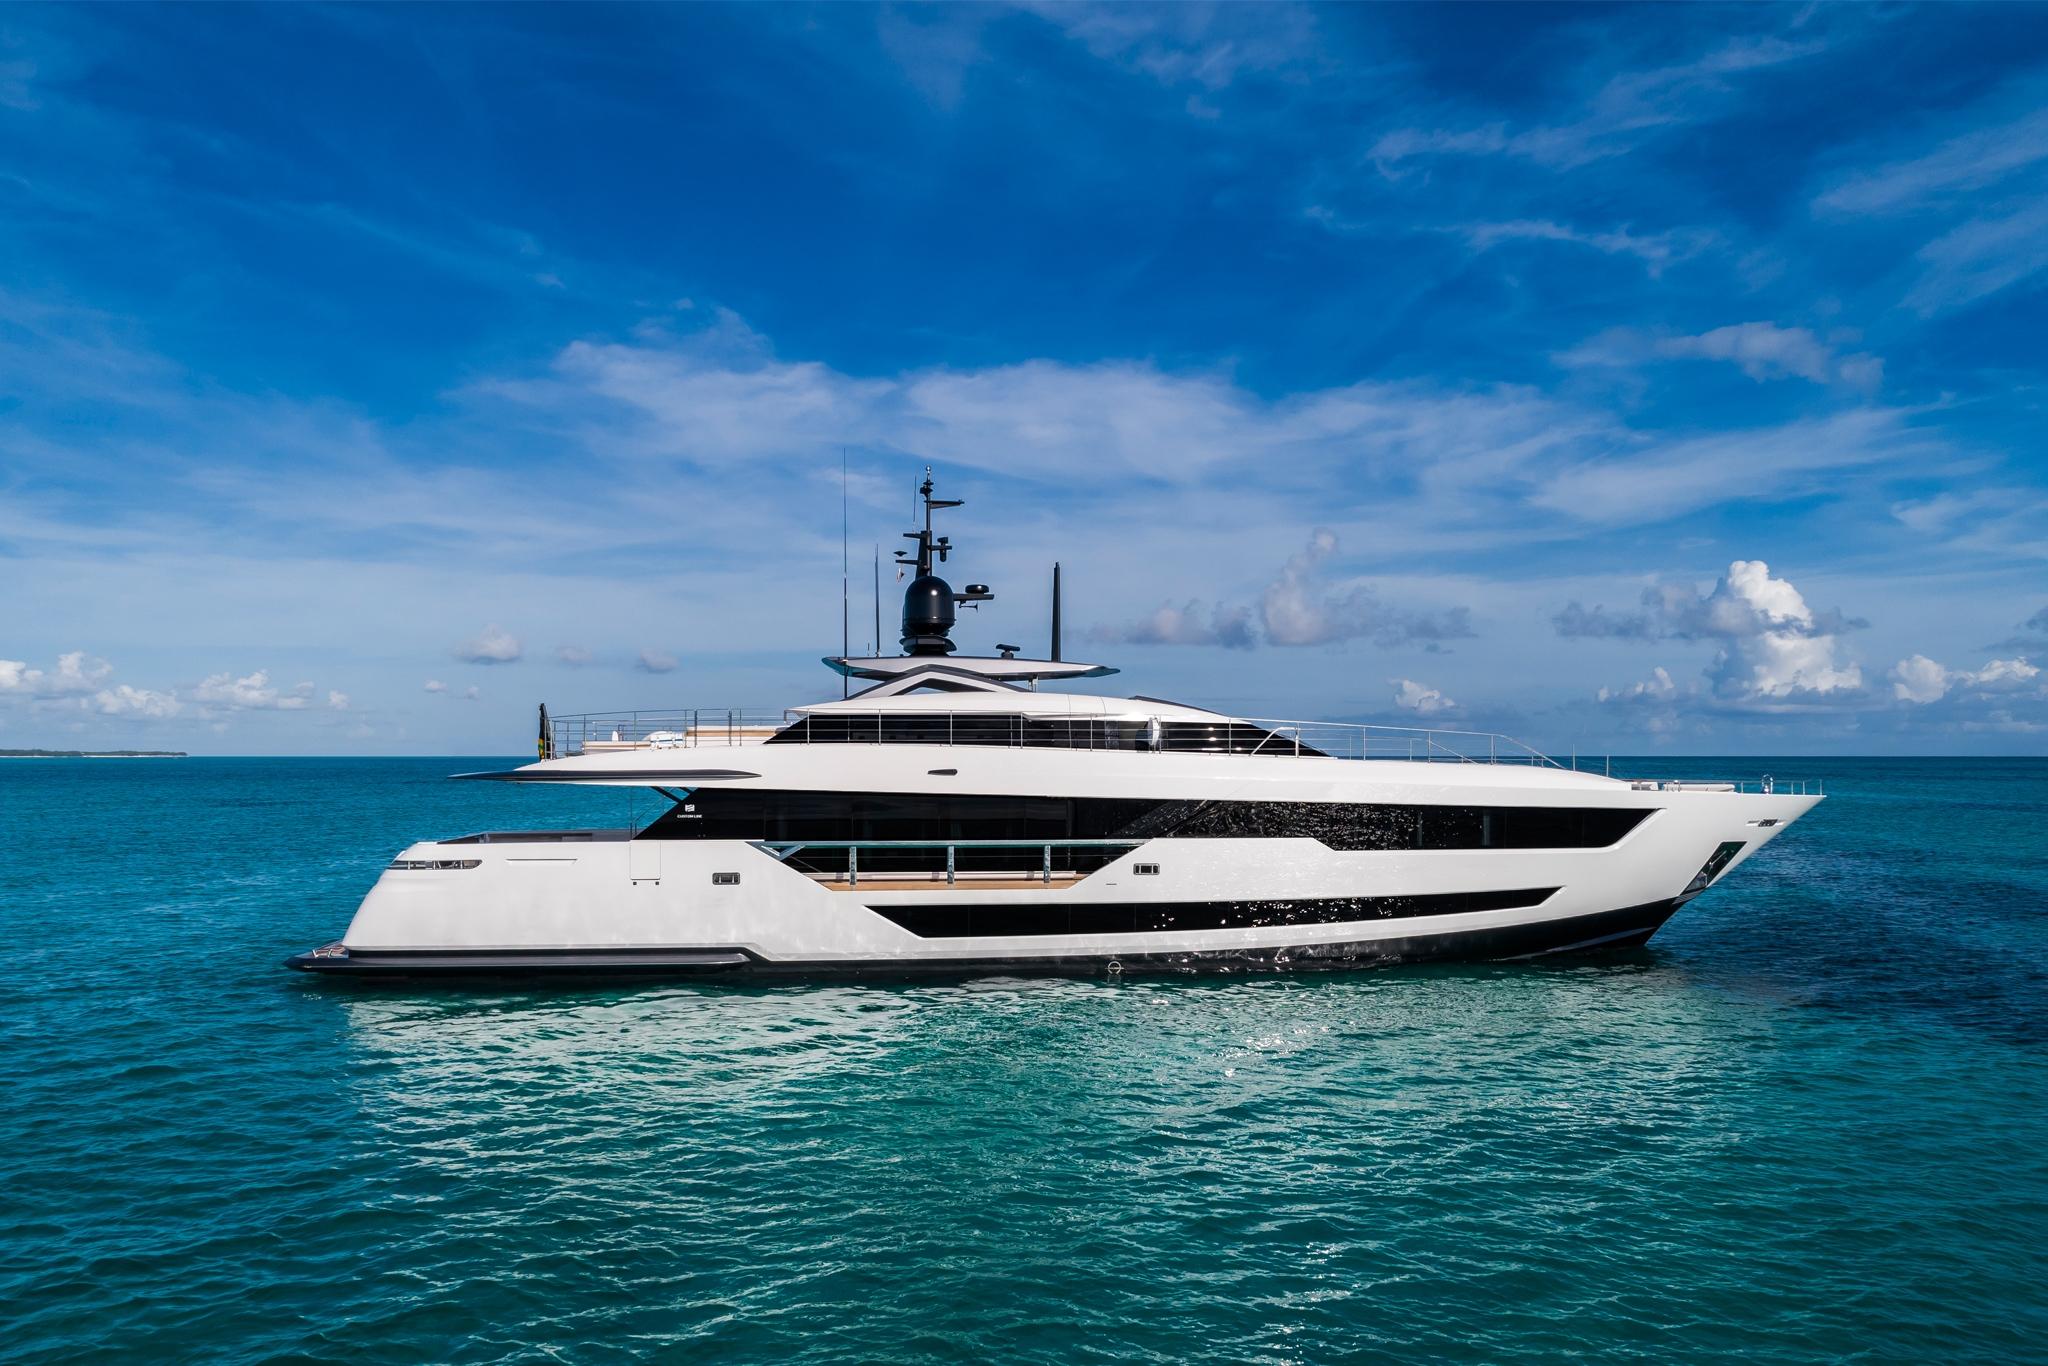 JMA Yachting Port Fréjus Var 83 vente location bateaux neufs Ferretti Group Custom Line Ferretti Yachts Pershing occasion places